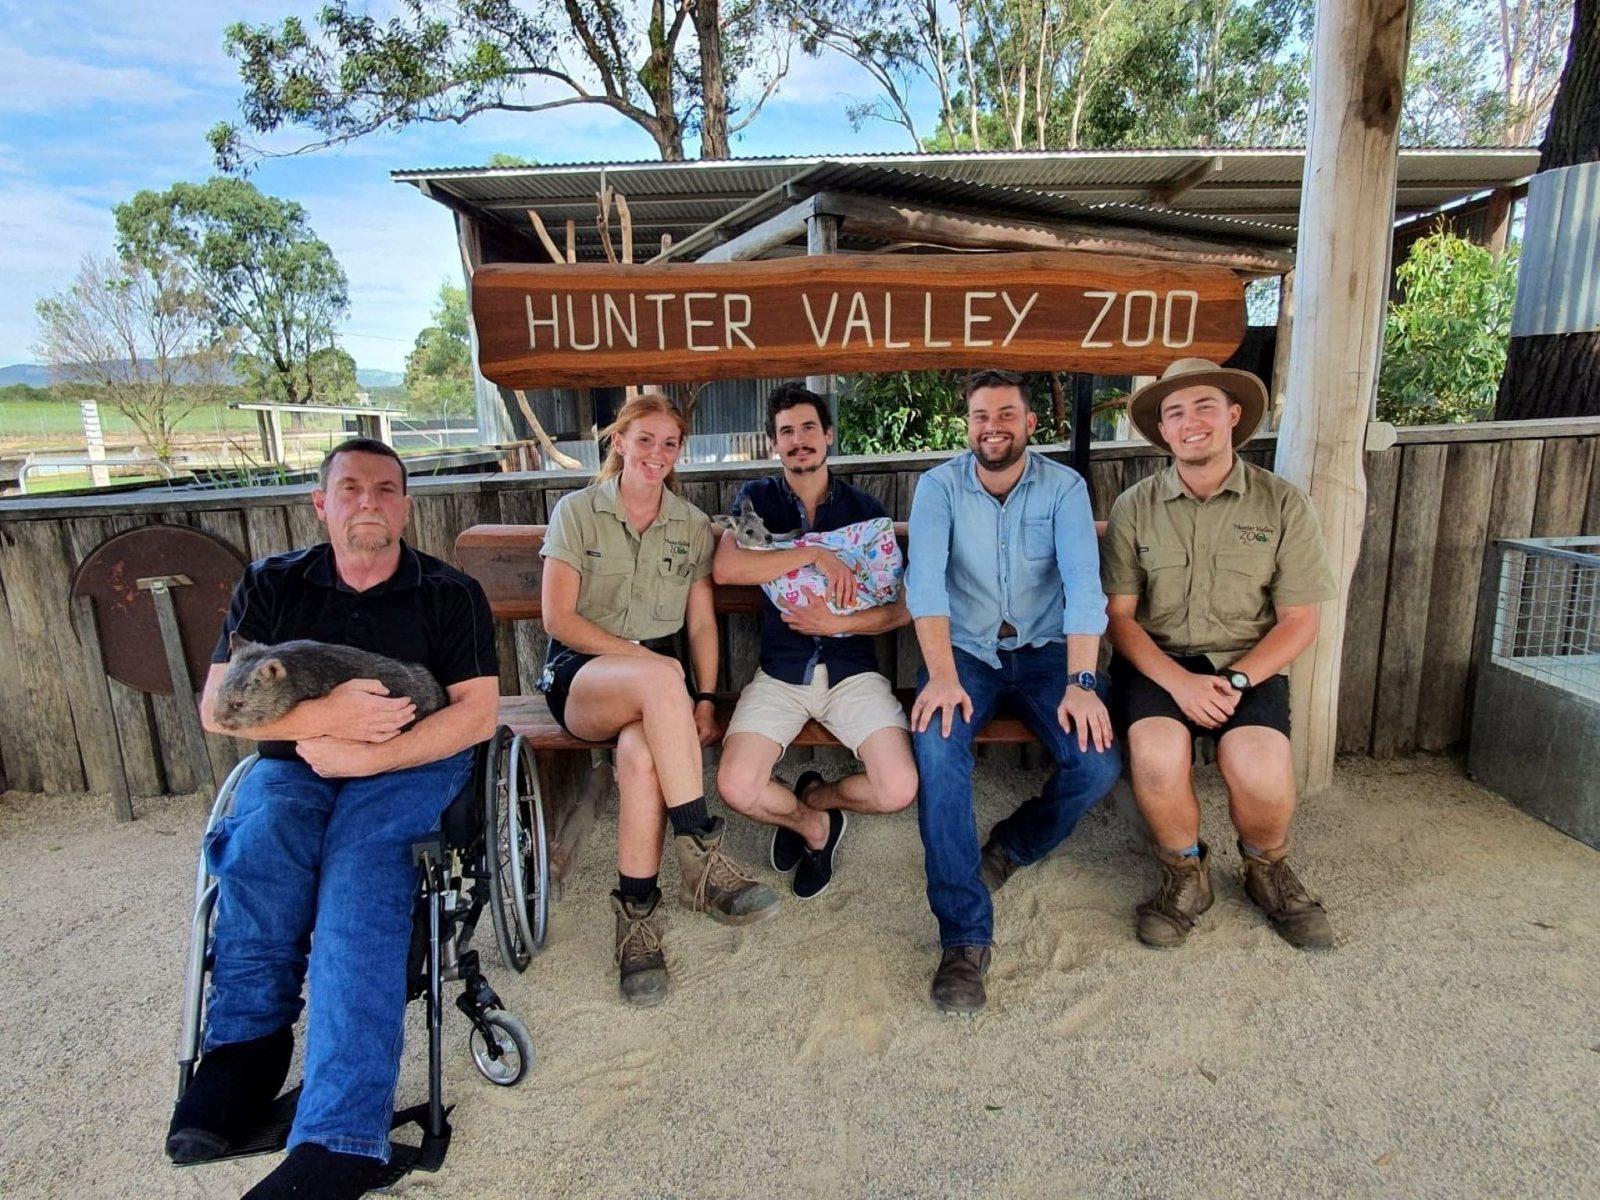 Kangaroo and wine experience